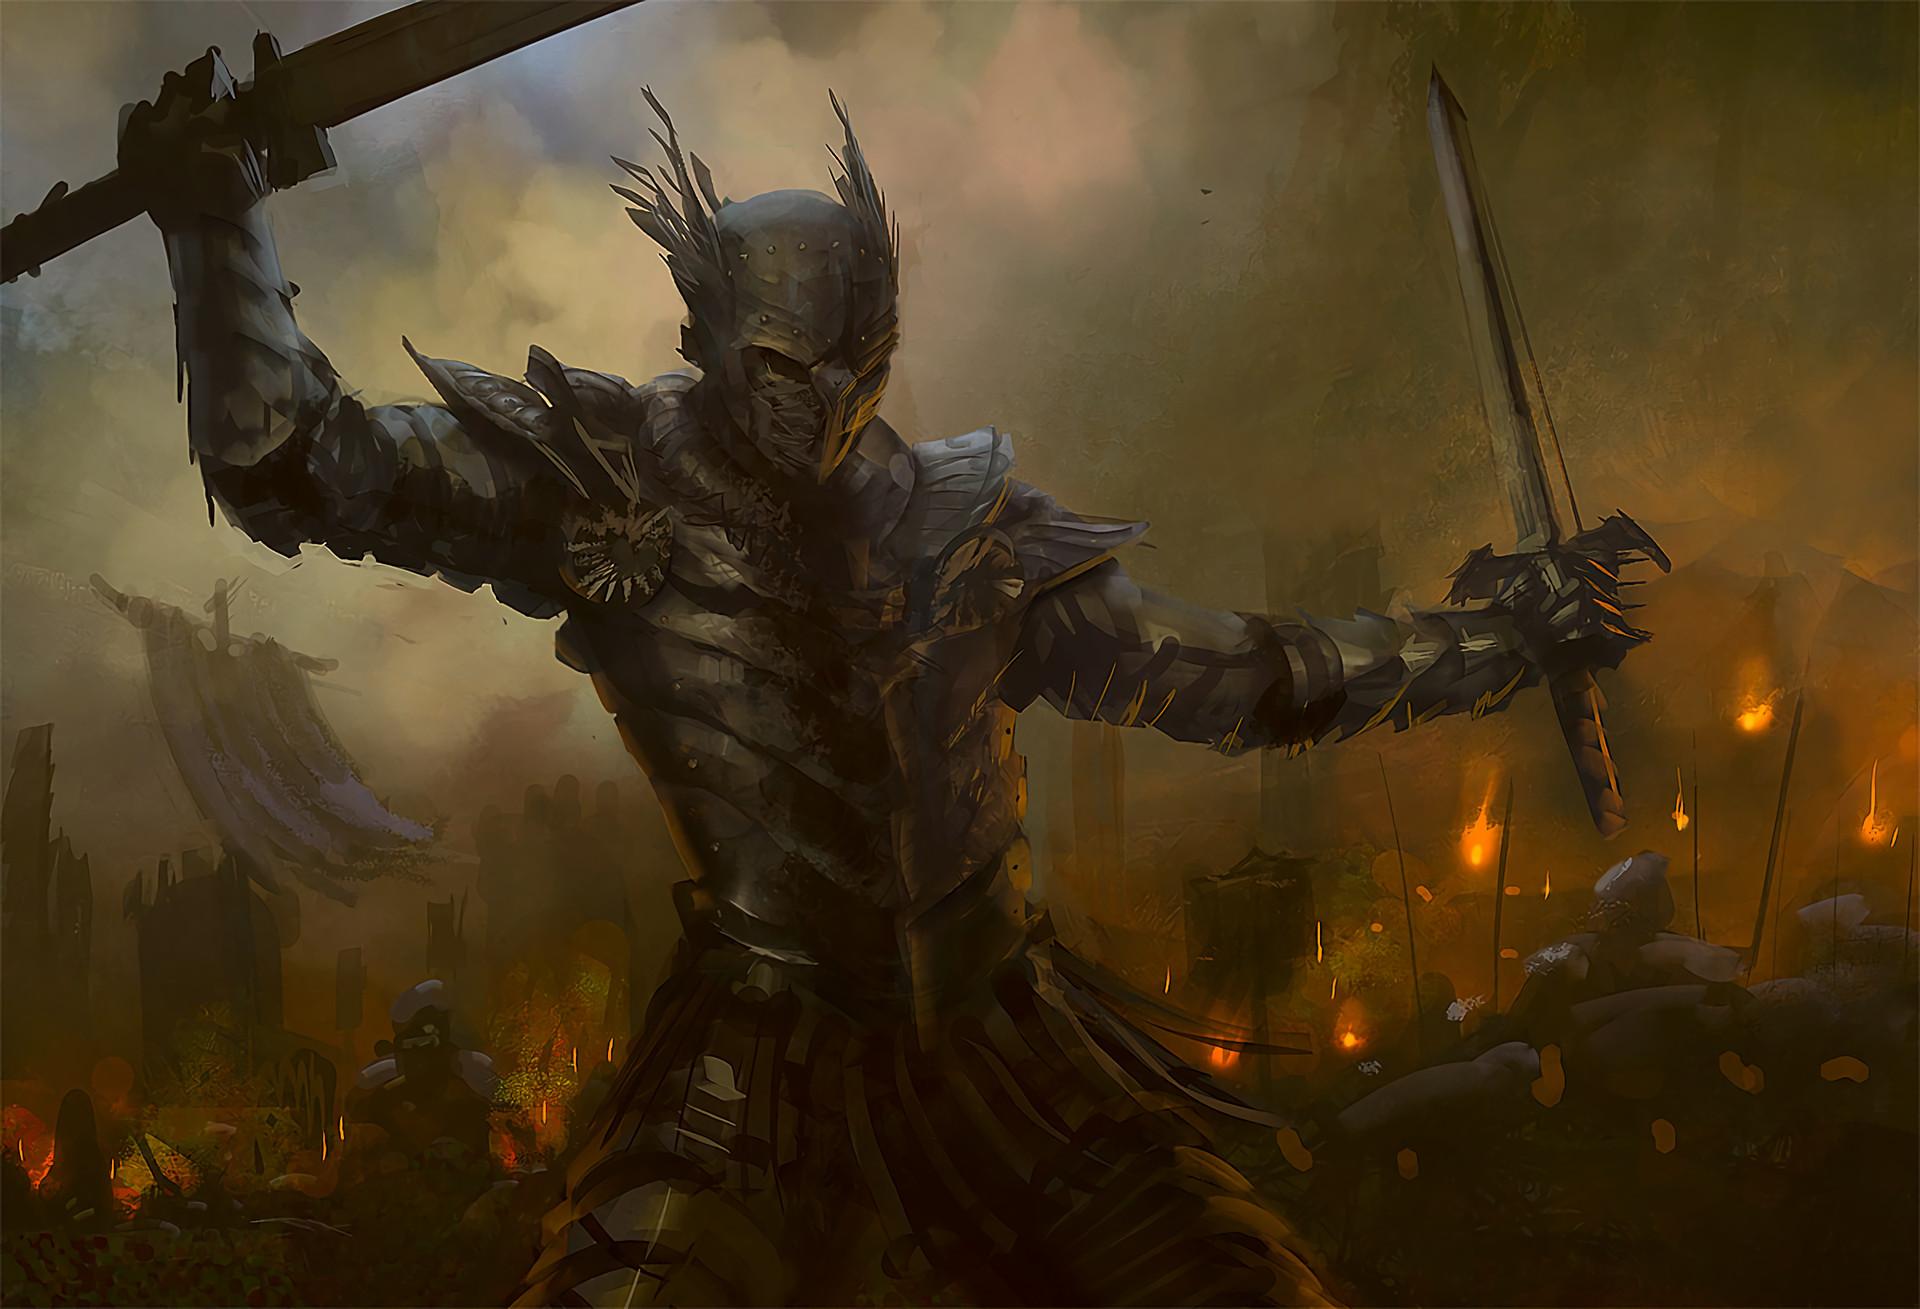 HD Wallpaper   Background ID:11362. Fantasy Warrior